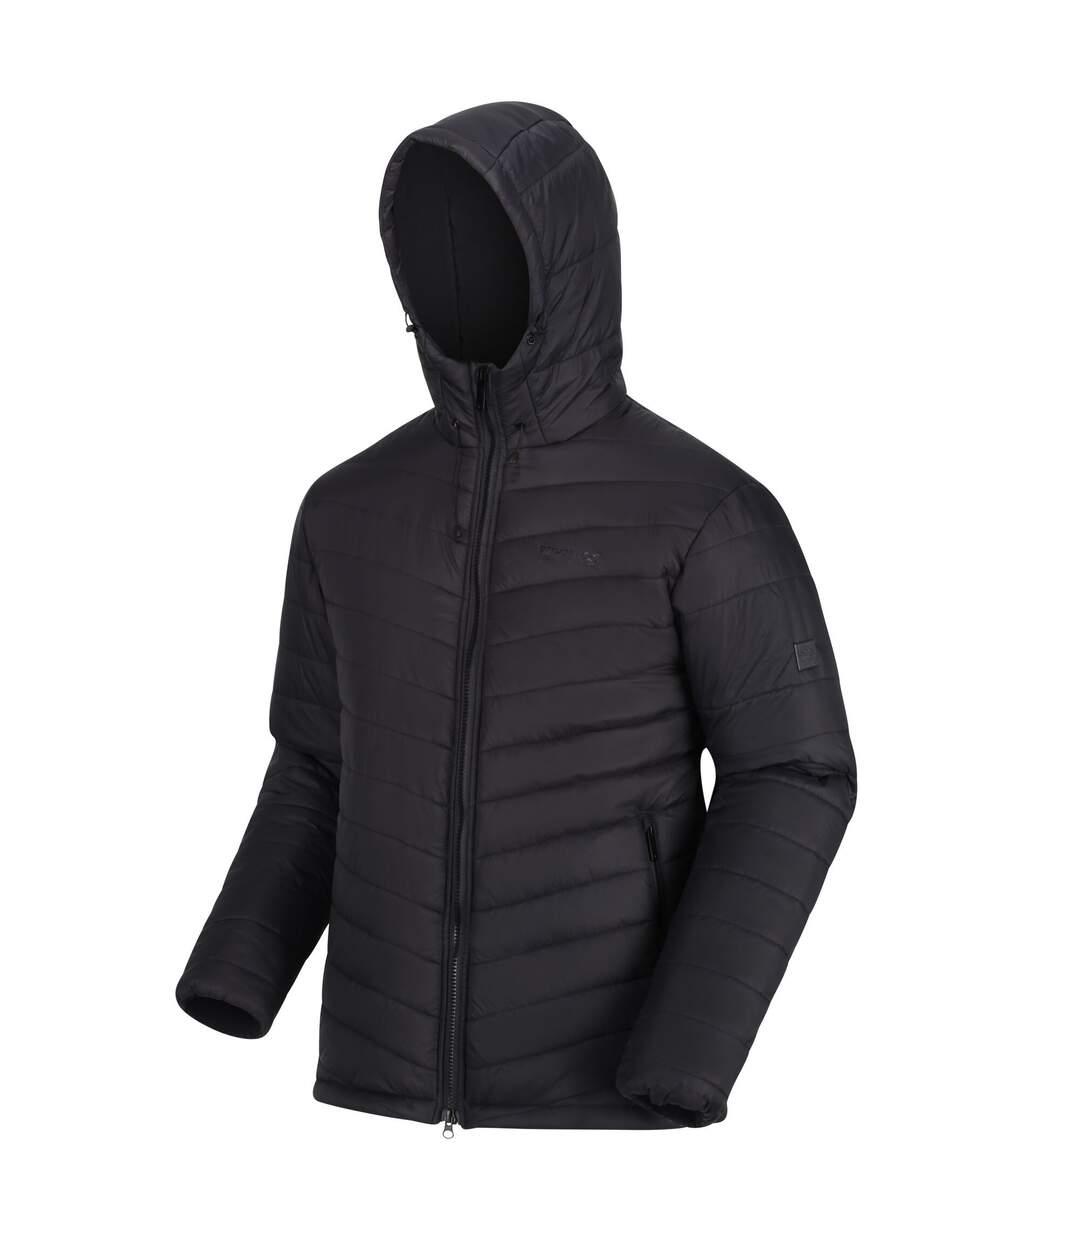 Regatta Mens Volter Loft Heated Insulated Jacket (Ash) - UTRG5674